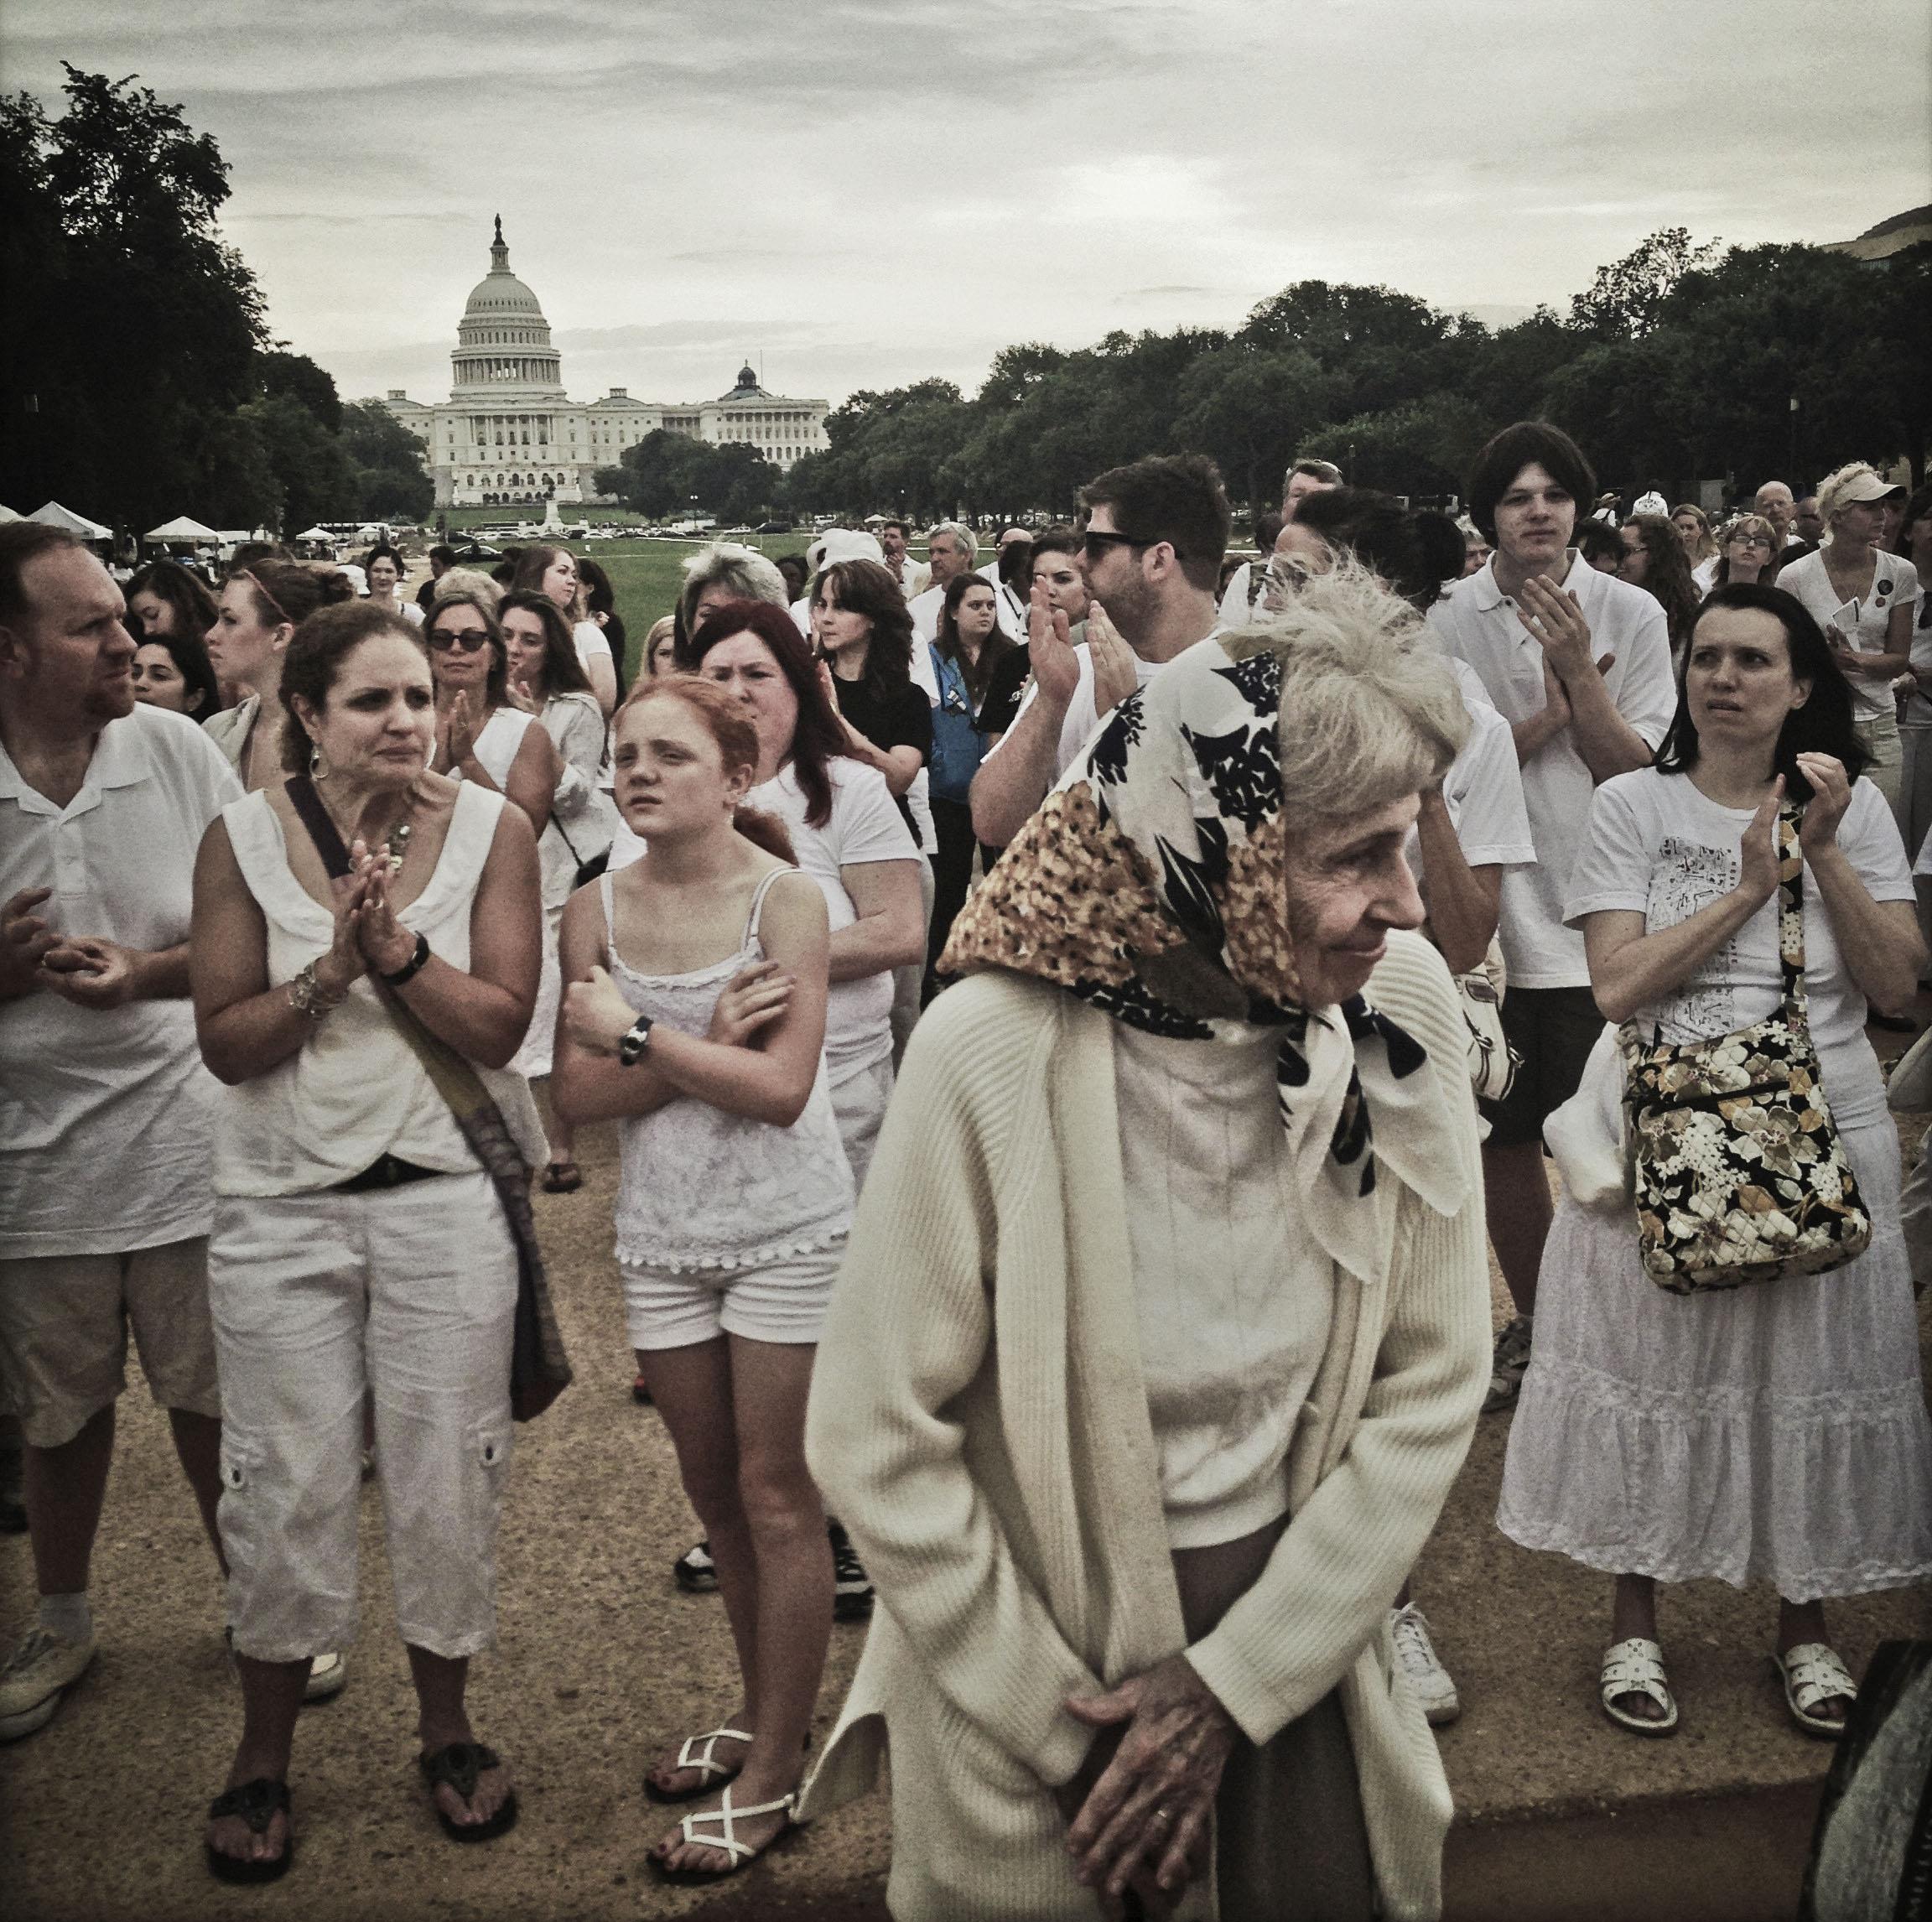 Participants at the One Million Bones installation on the National Mall in Washington DC. Photo: Teru Kuwayama